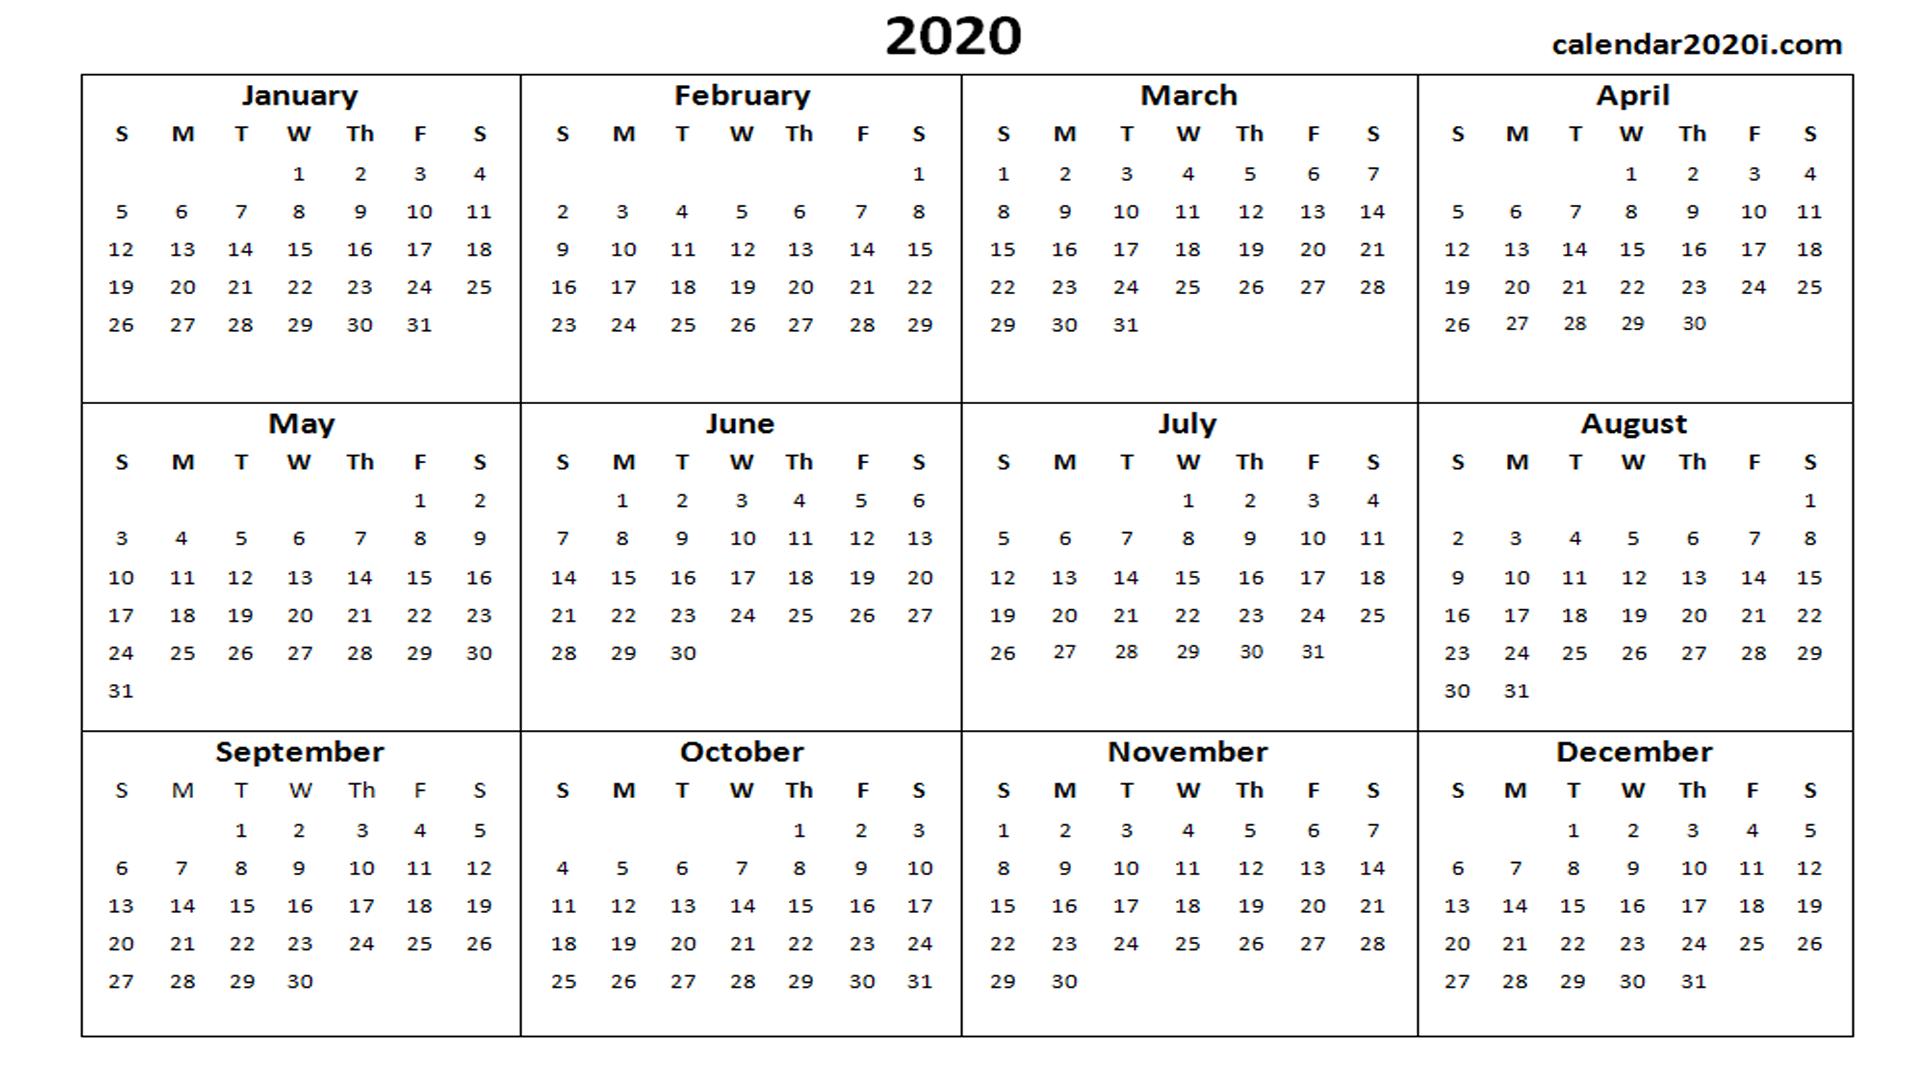 2020 Calendar Printable Template Holidays, Word, Excel with regard to Printable Blank Calendar Template